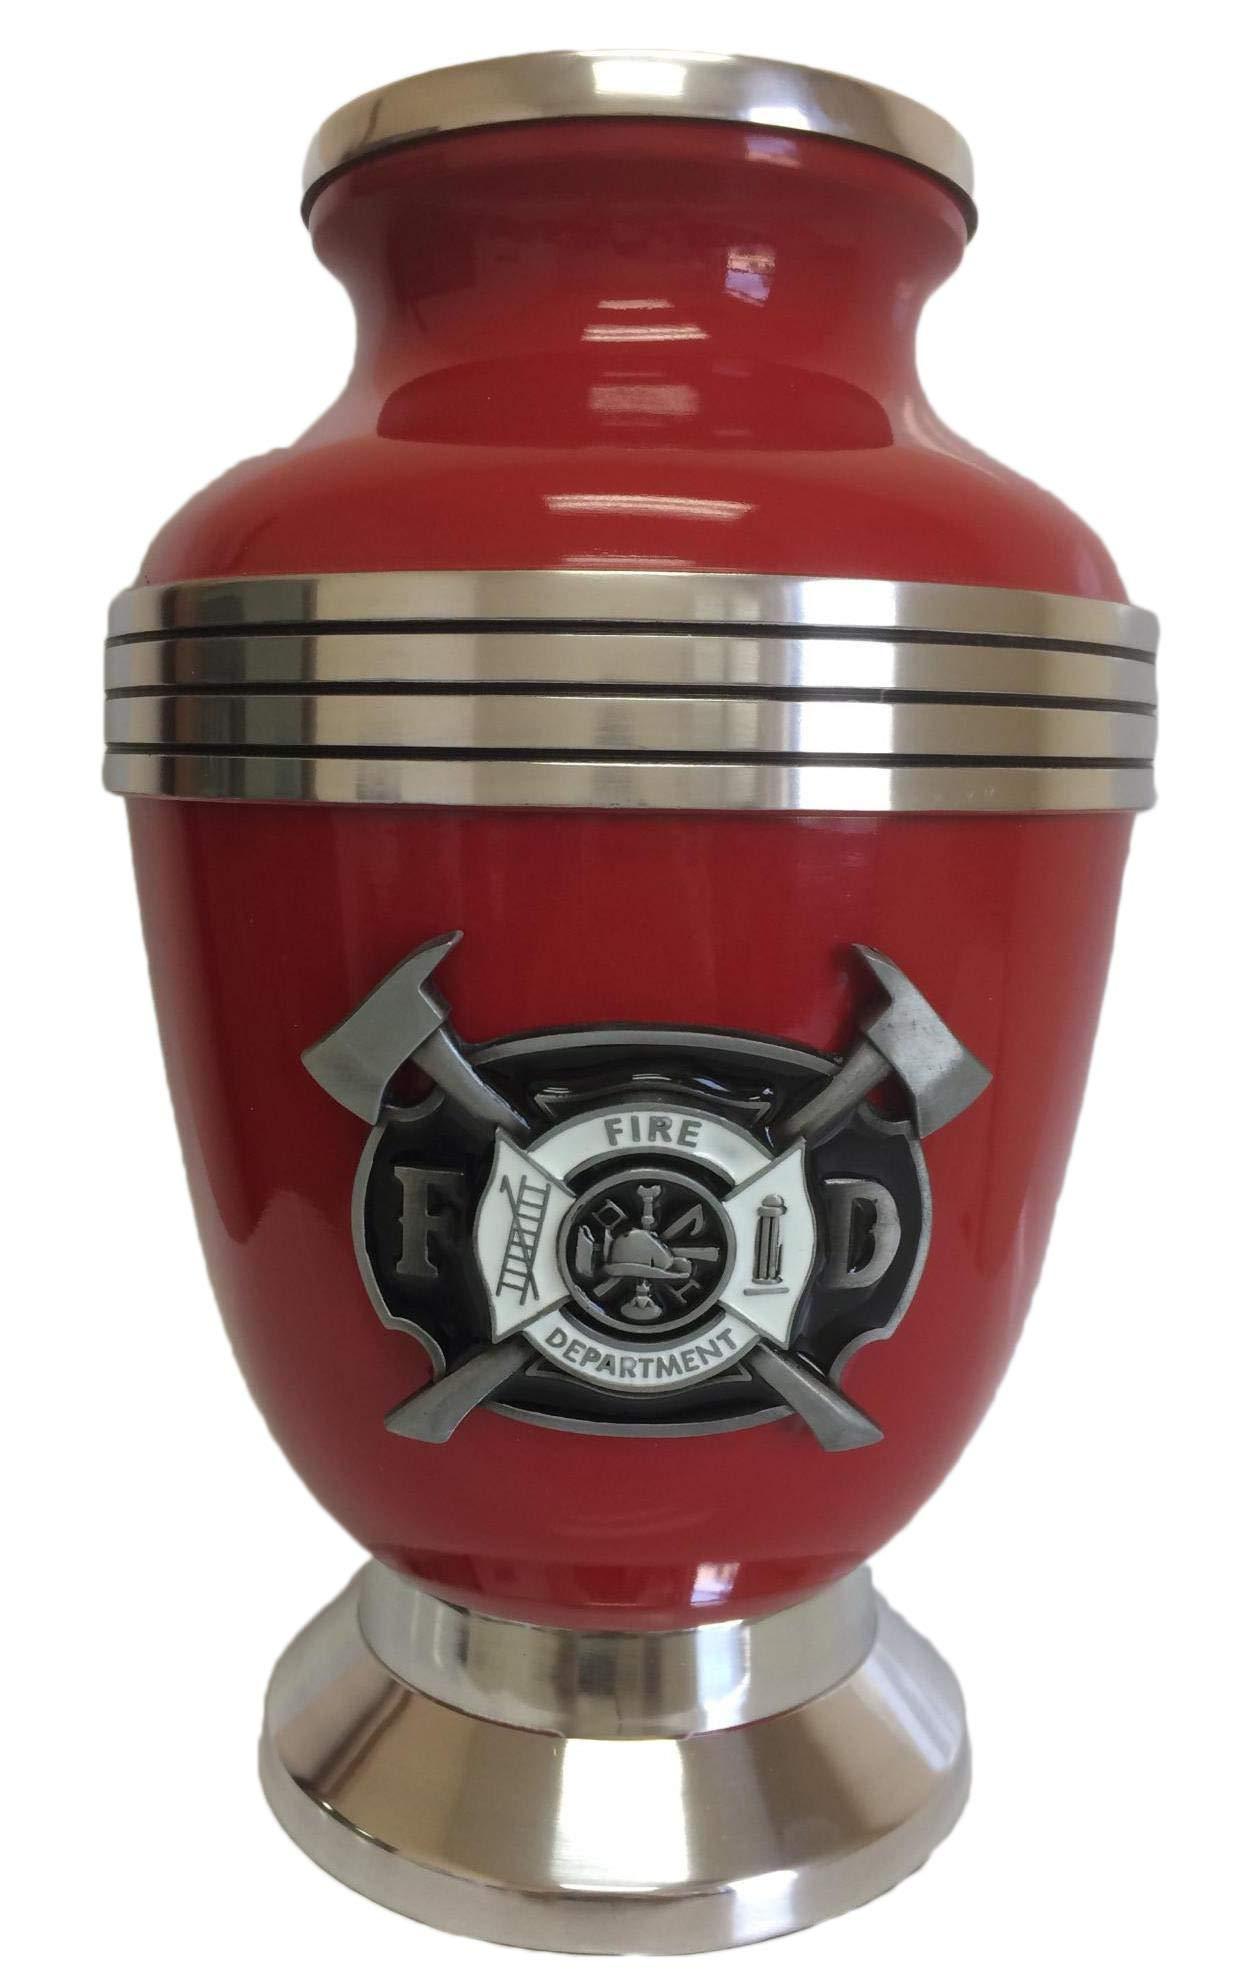 217 Firemens Fireman Firefighter Red Adult Memorial Cremation Urn